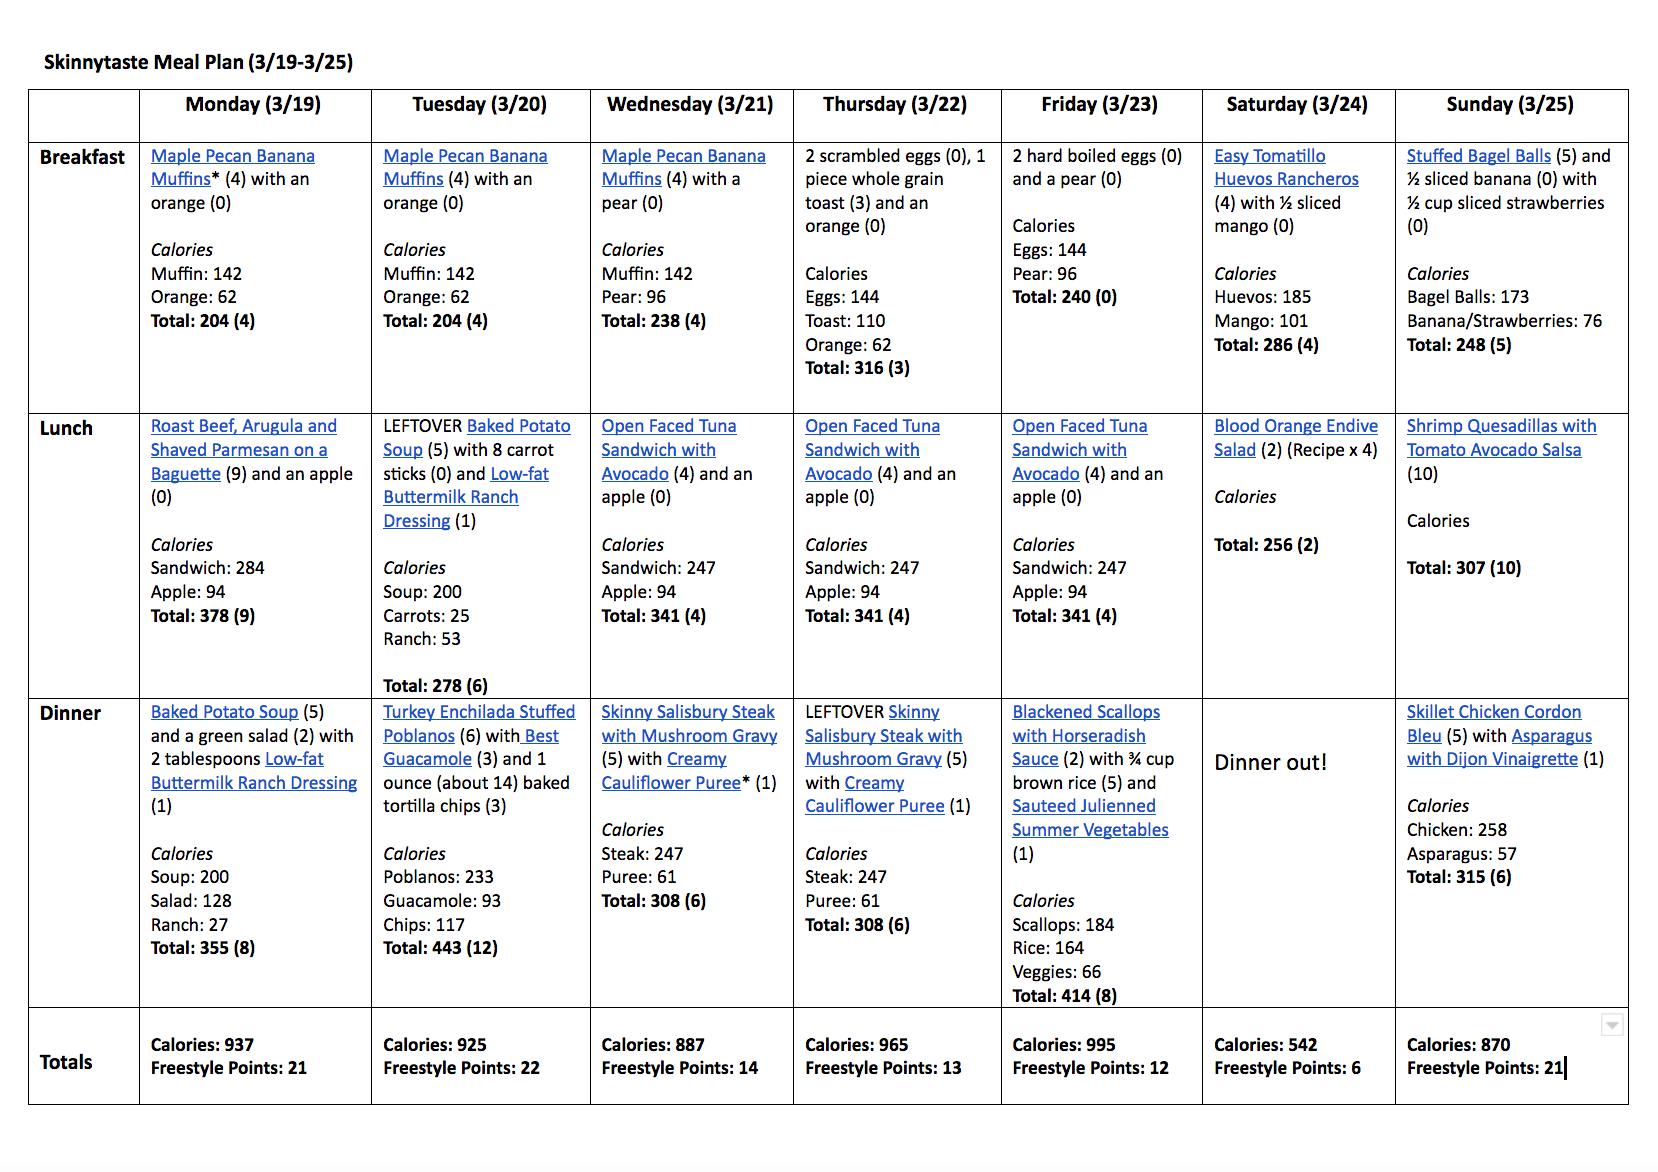 Skinnytaste Meal Plan March 19 March 25